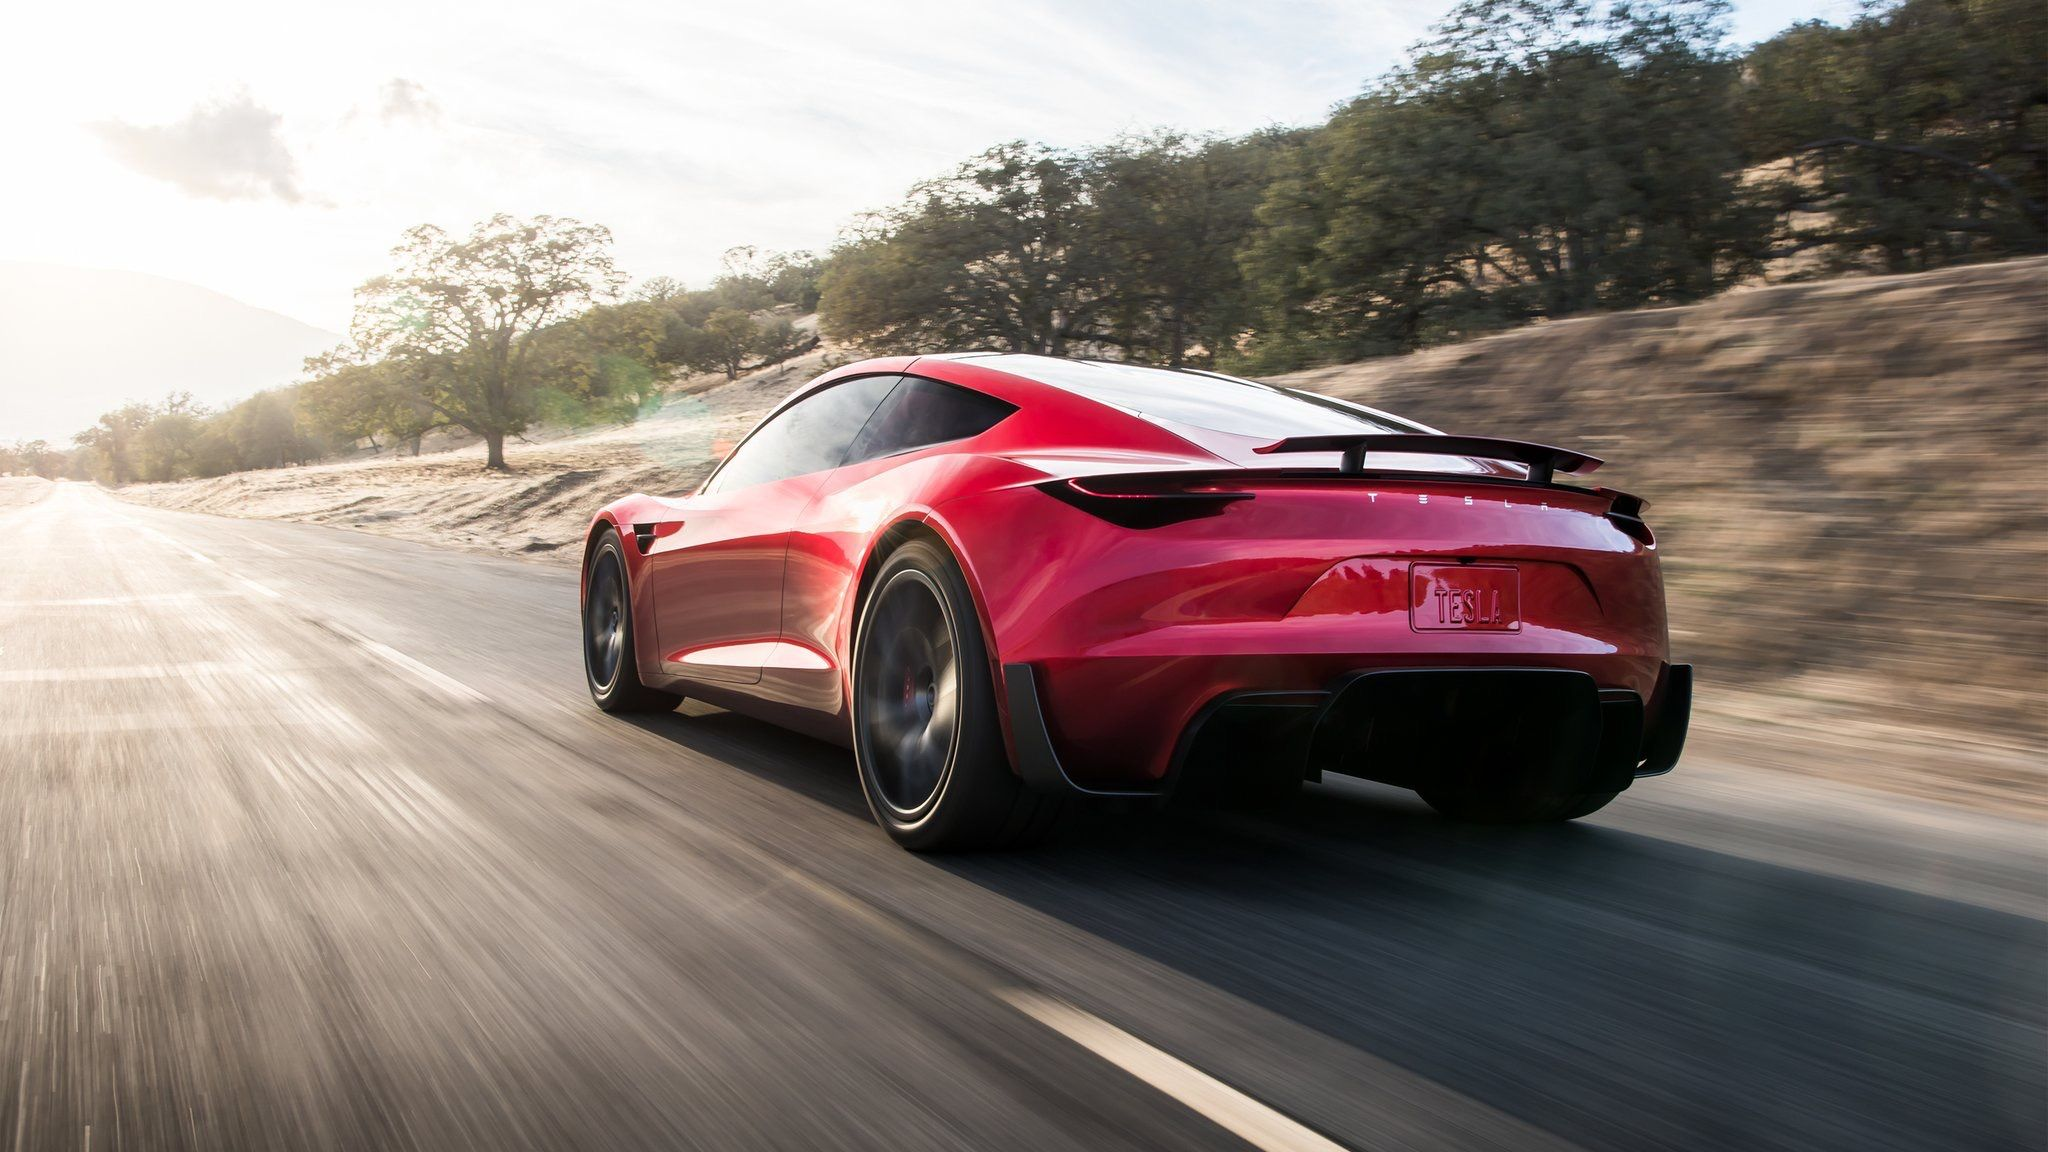 Tesla Roadster (With images) Tesla roadster, Electric